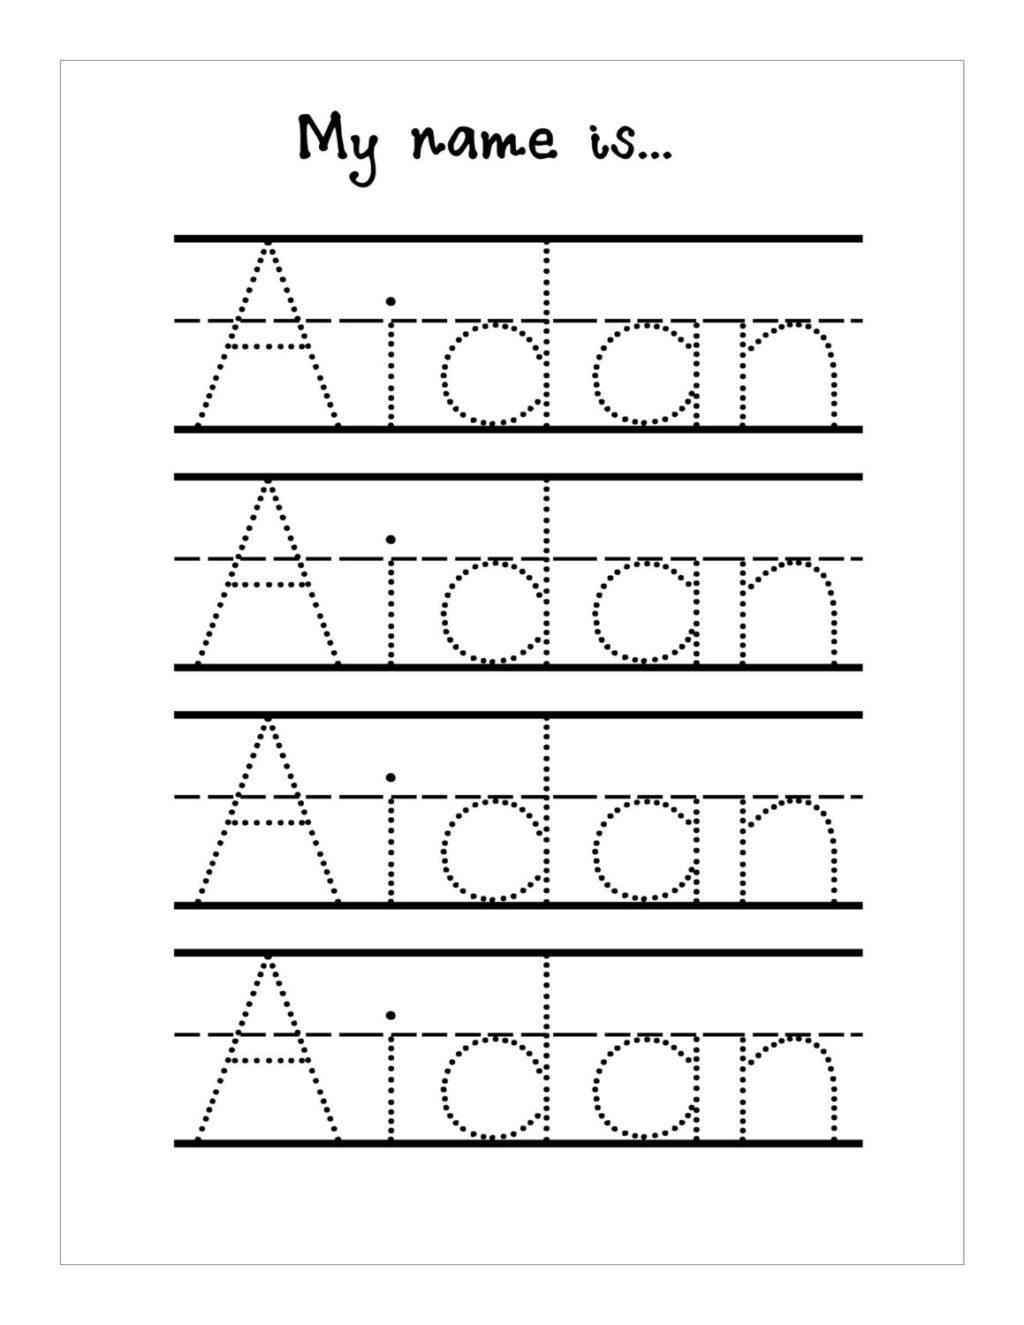 Worksheet ~ Nameacing Sheets Generator For Preschool Line within Alphabet Name Tracing Worksheets